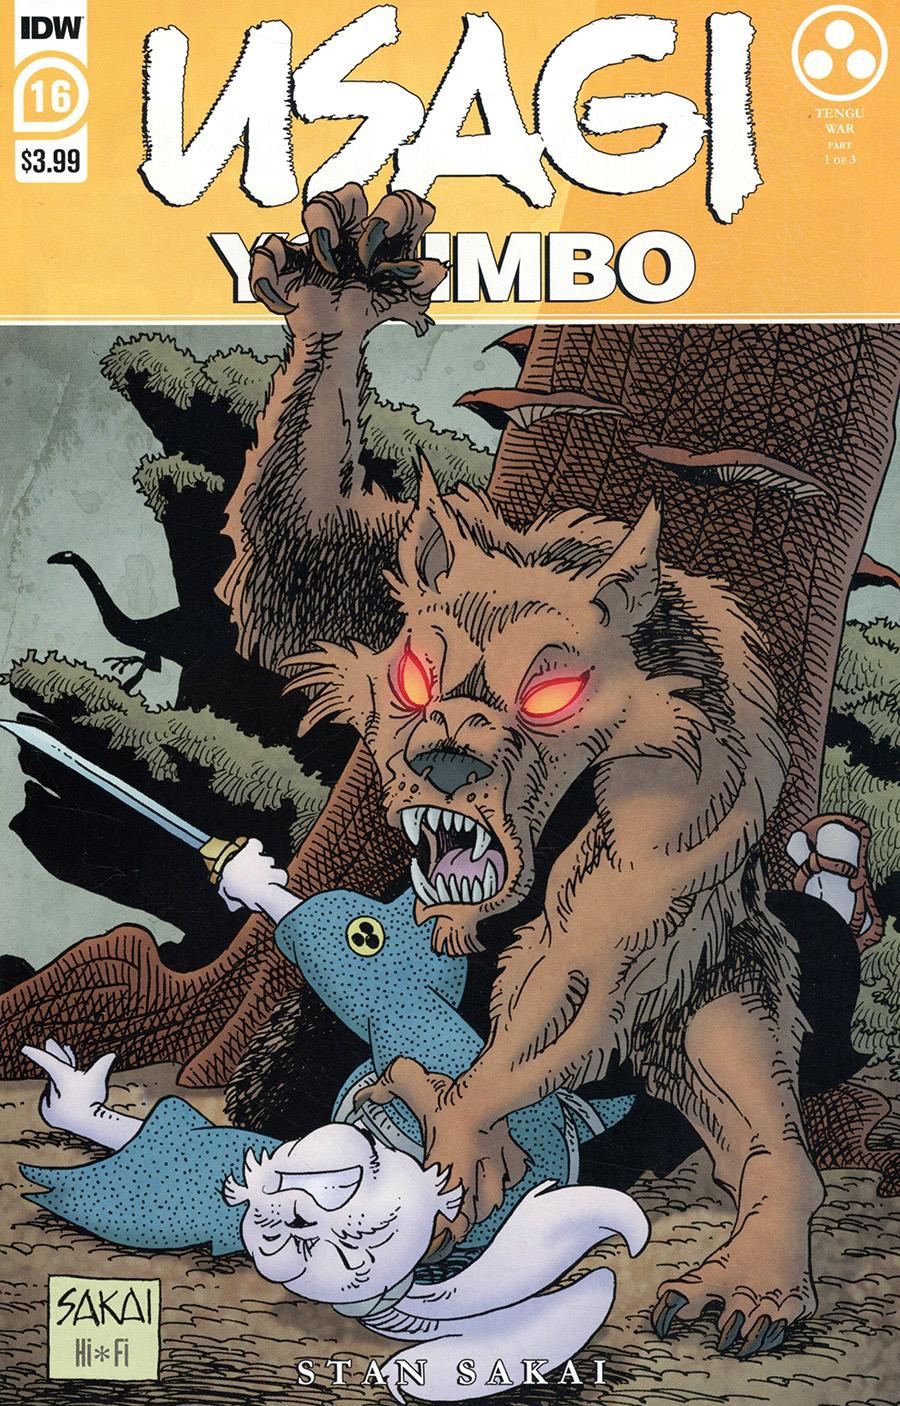 Usagi Yojimbo Vol 4 #16 Cover A Regular Stan Sakai Cover